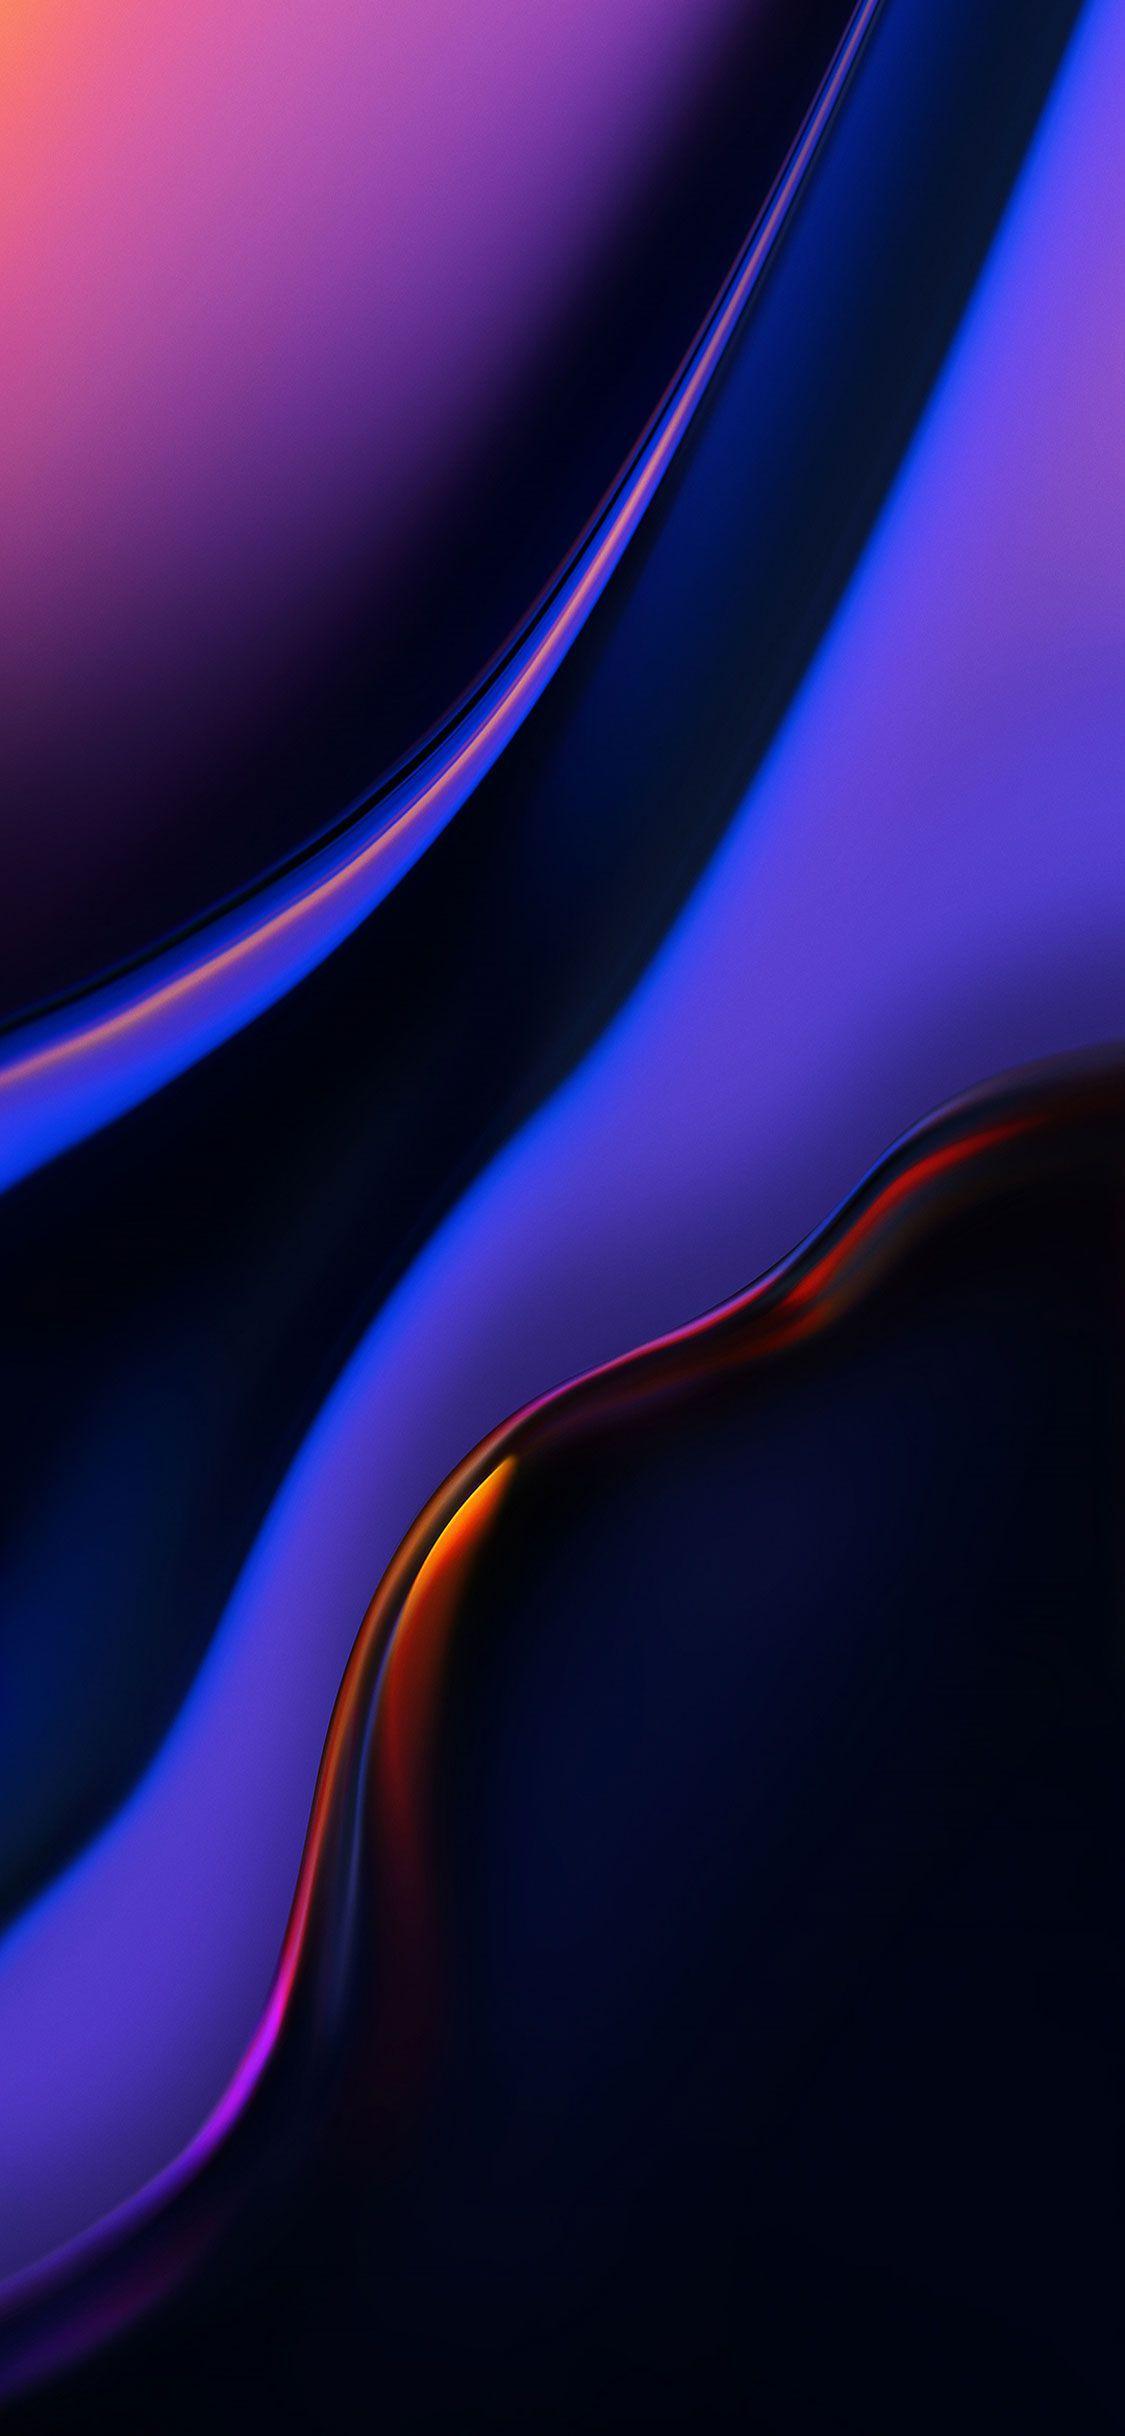 Liquid iPhone X Wallpapers - Top Free